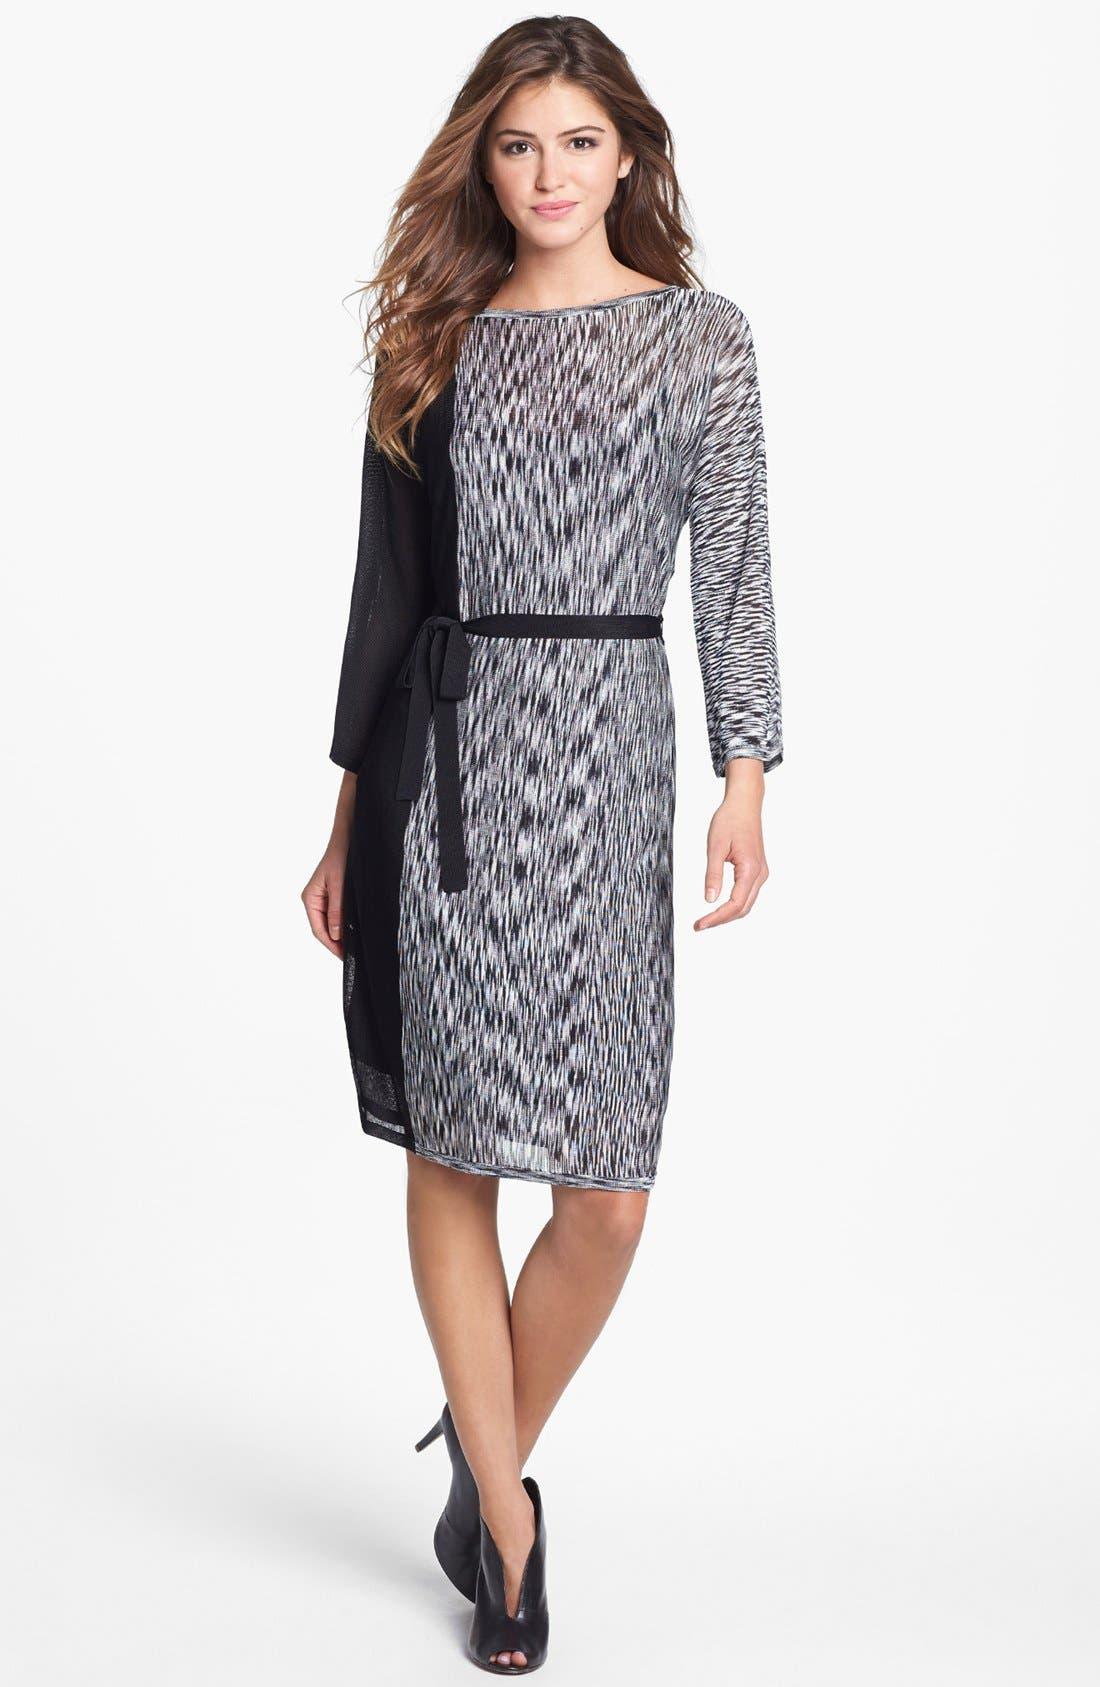 Alternate Image 1 Selected - Trina Turk Print Tie Waist Shift Dress